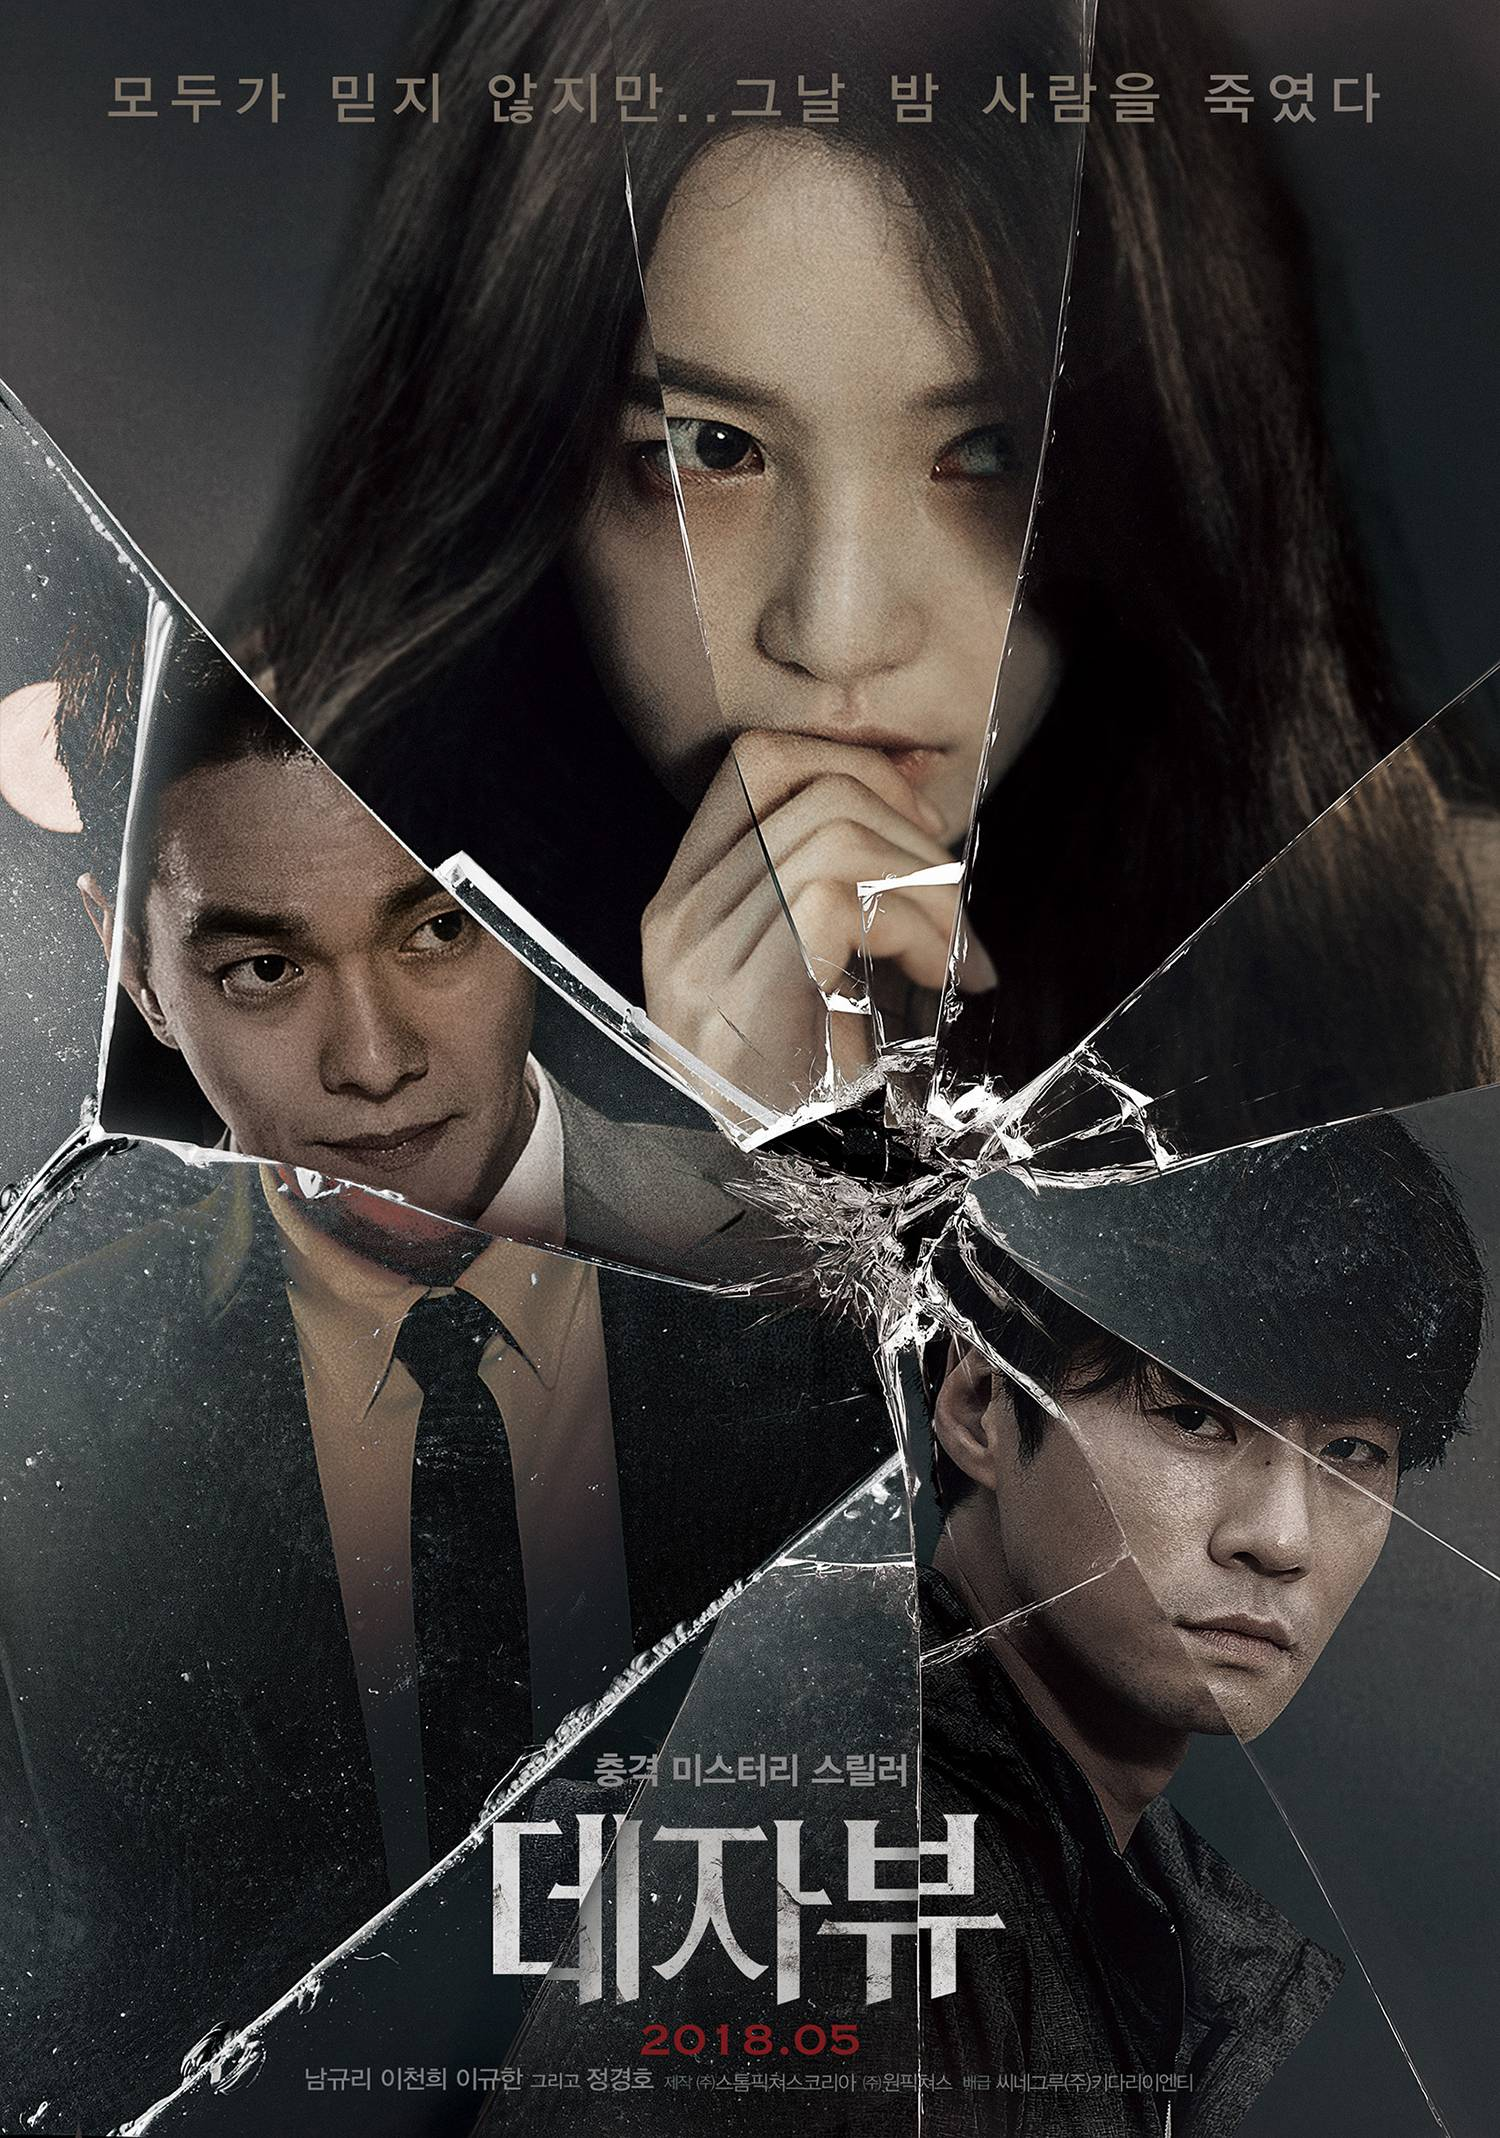 Deja Vu Cast (Korean Movie - 2017) - 데자뷰 @ HanCinema